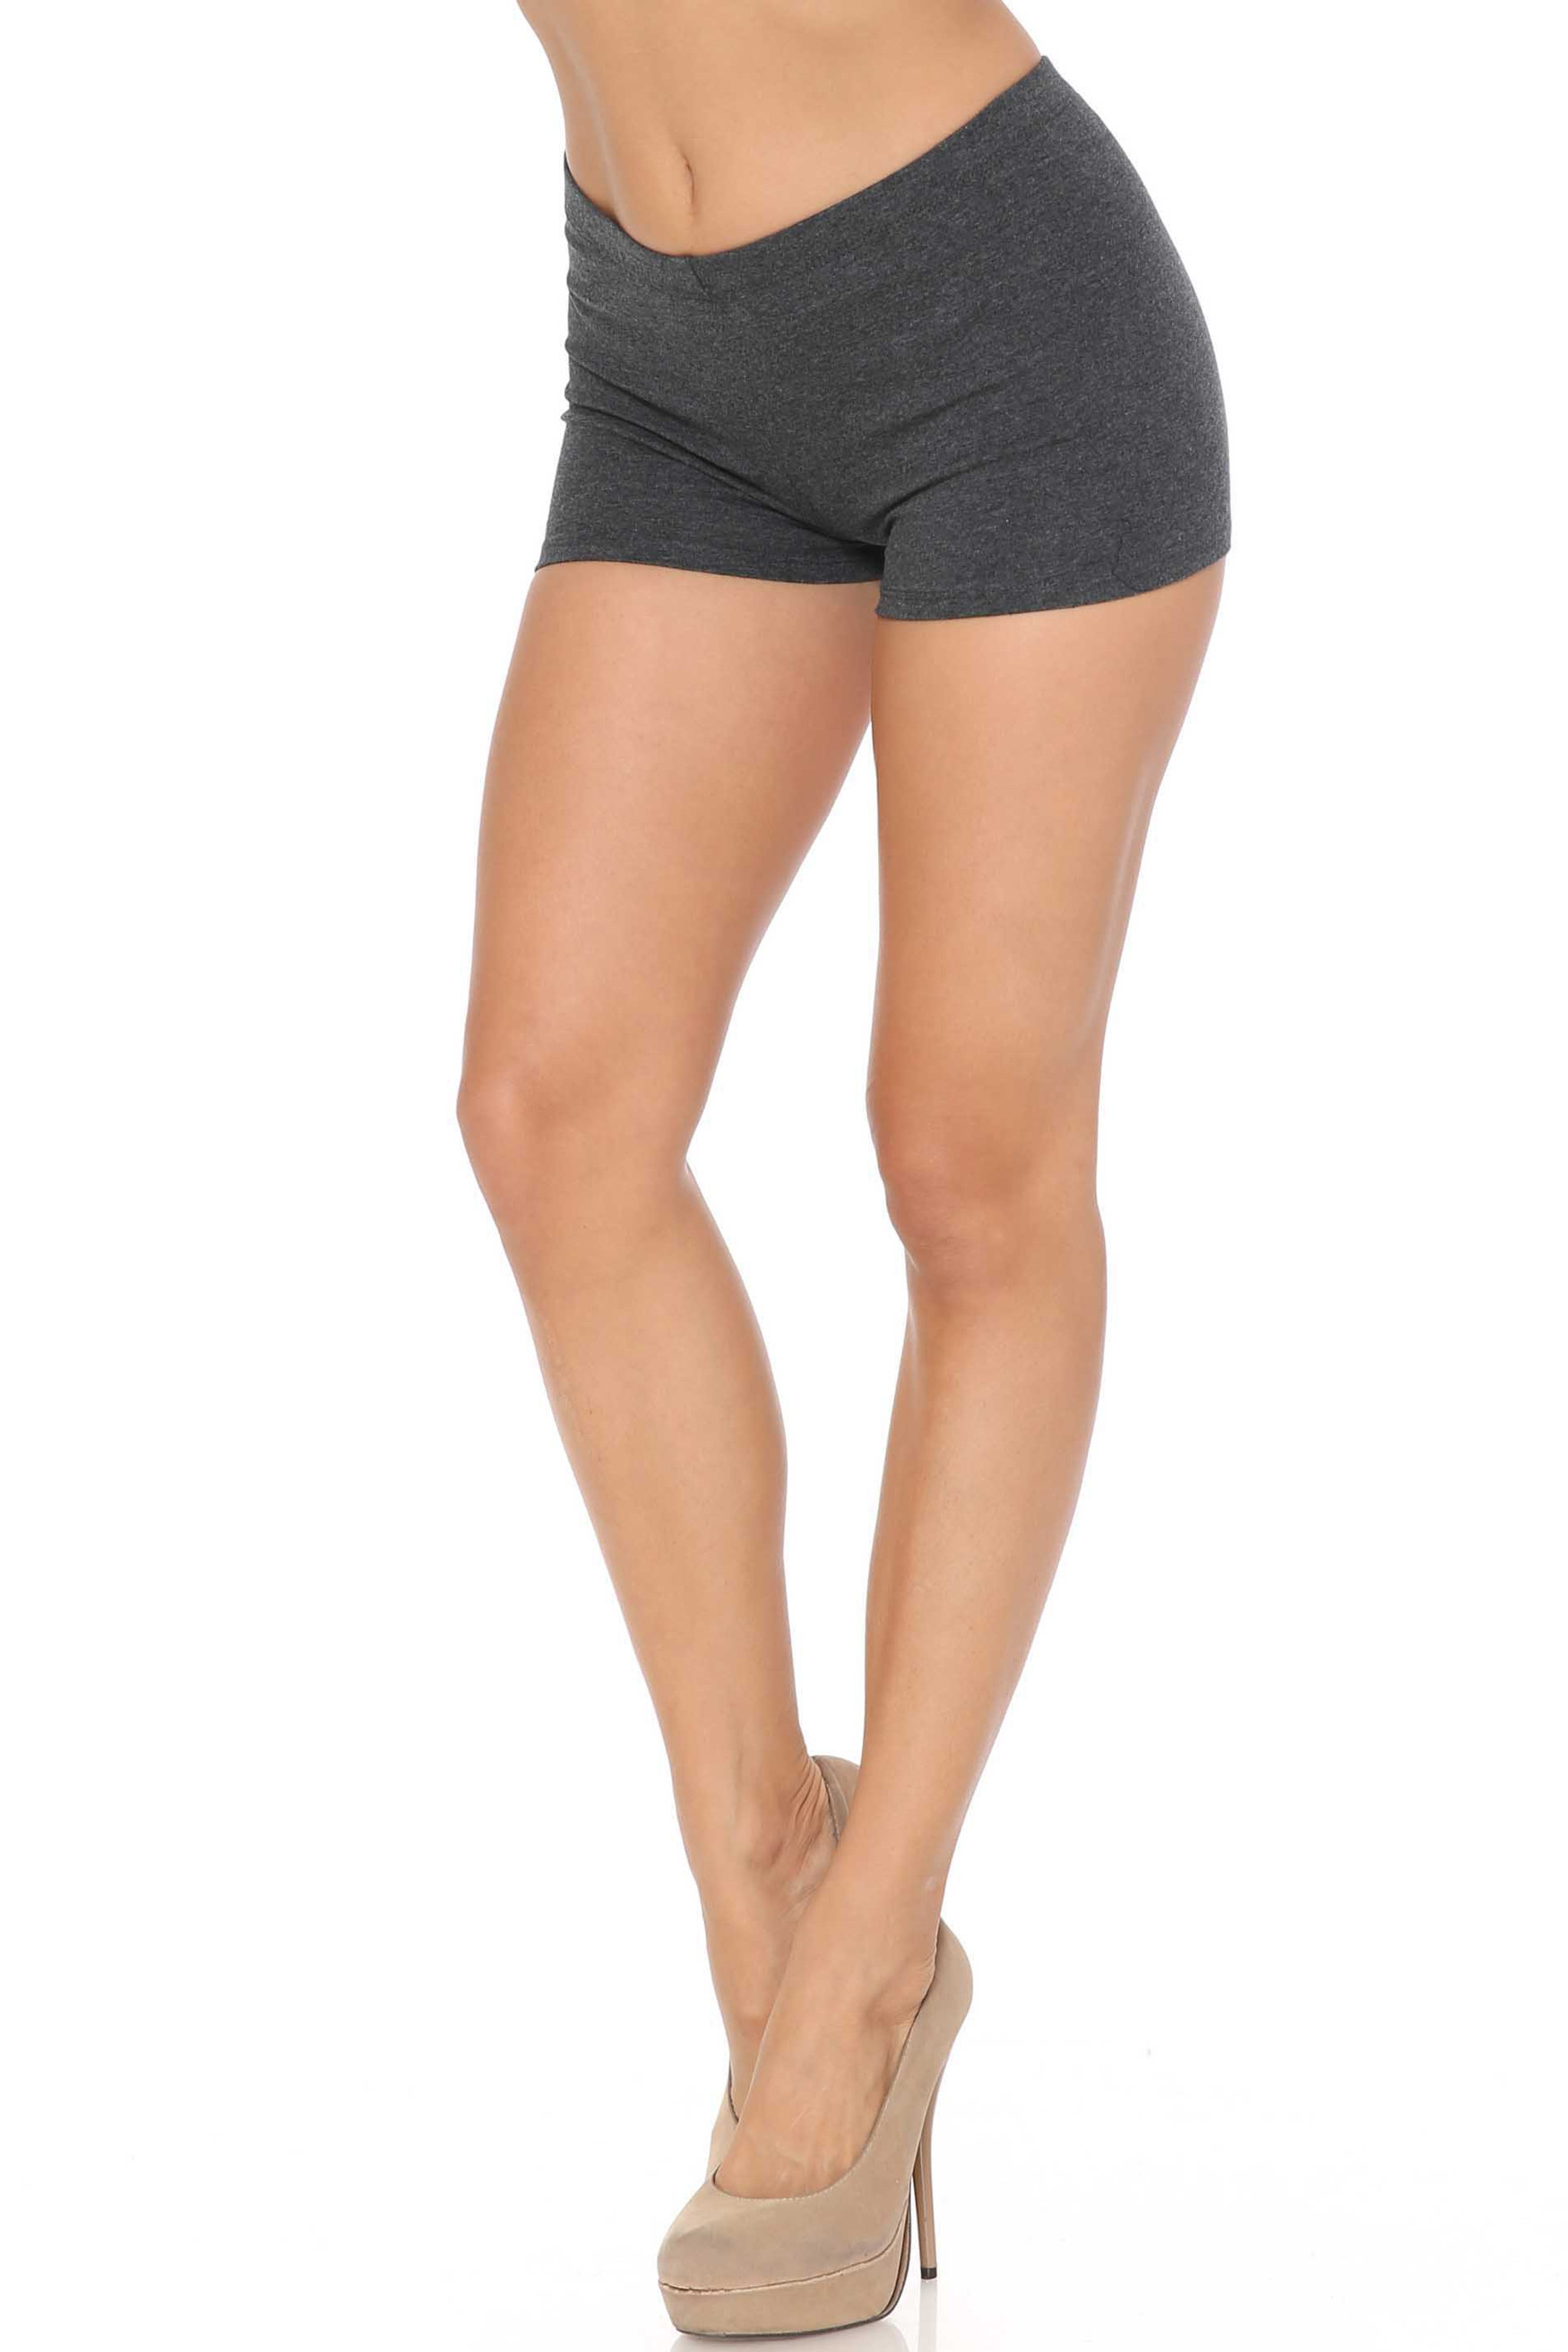 Charcoal USA Cotton Boy Shorts